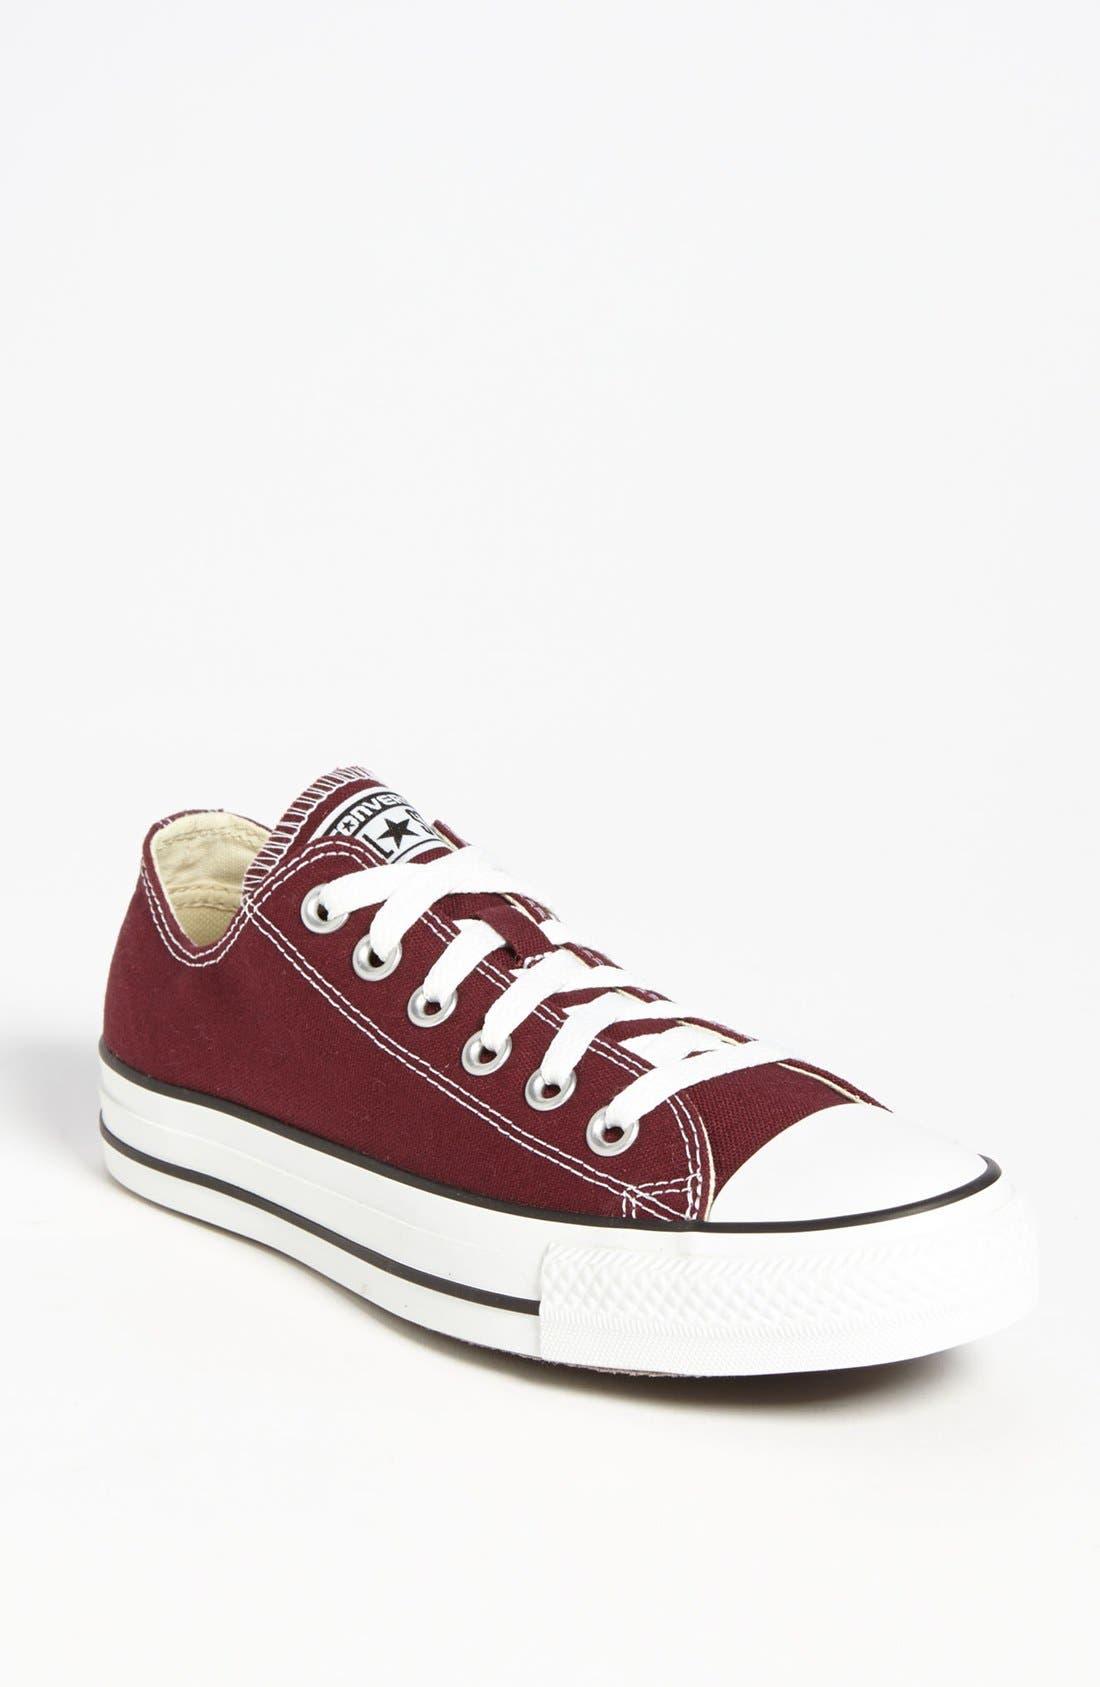 Chuck Taylor<sup>®</sup> All Star<sup>®</sup> Sneaker,                             Main thumbnail 1, color,                             930